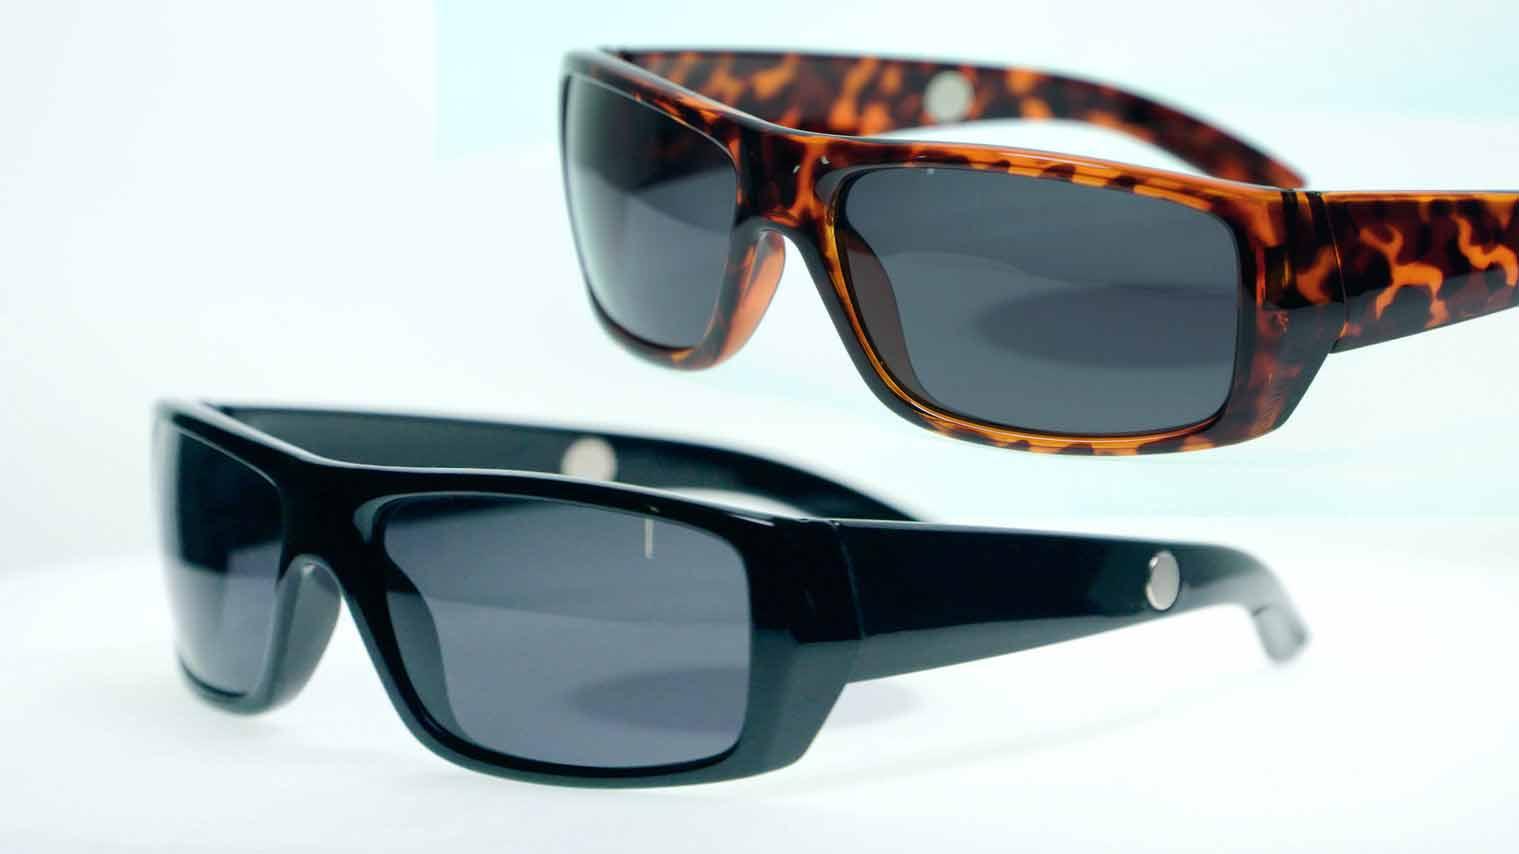 Diamond Vision okulary polaryzacyjne opinie